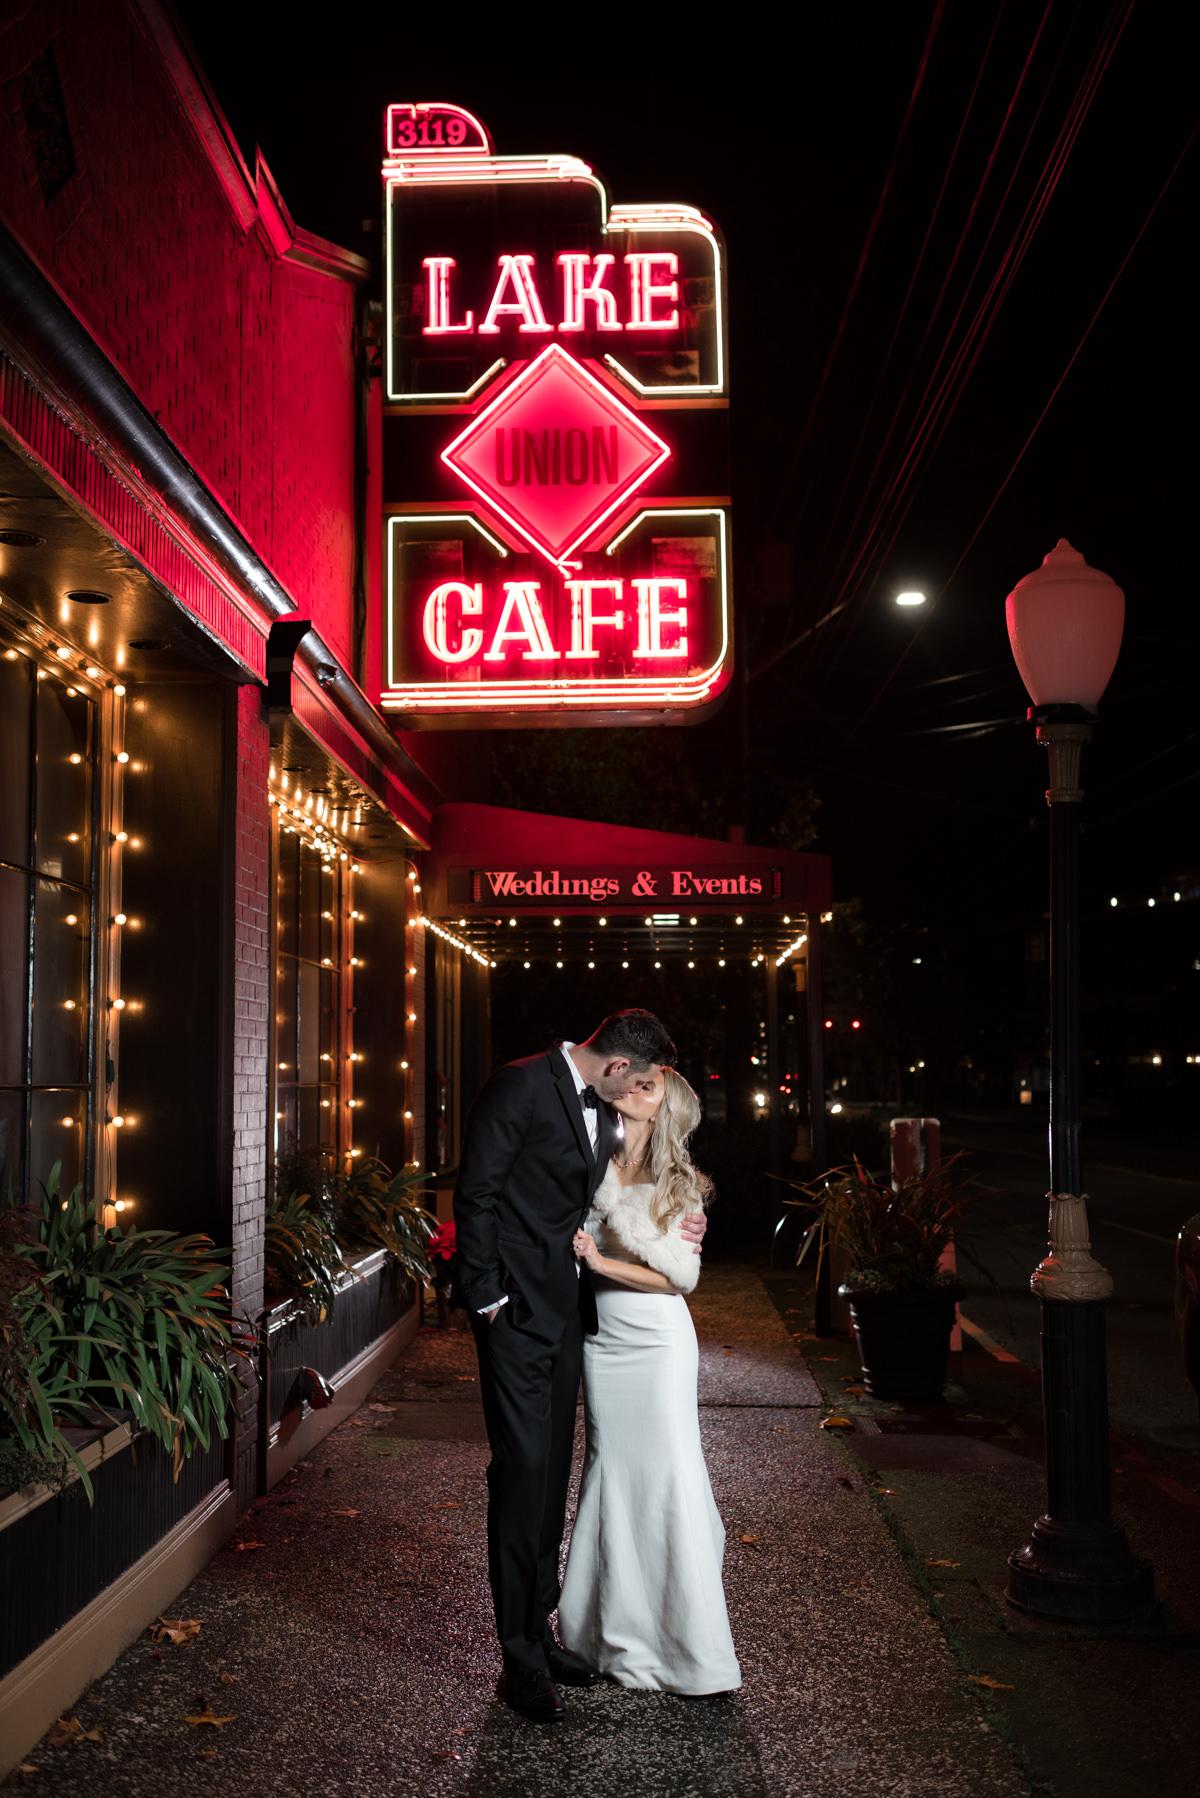 Andrew Tat - Documentary Wedding Photography - Lake Union Cafe - Seattle, Washington -Rachel and Ryan - 55.jpg